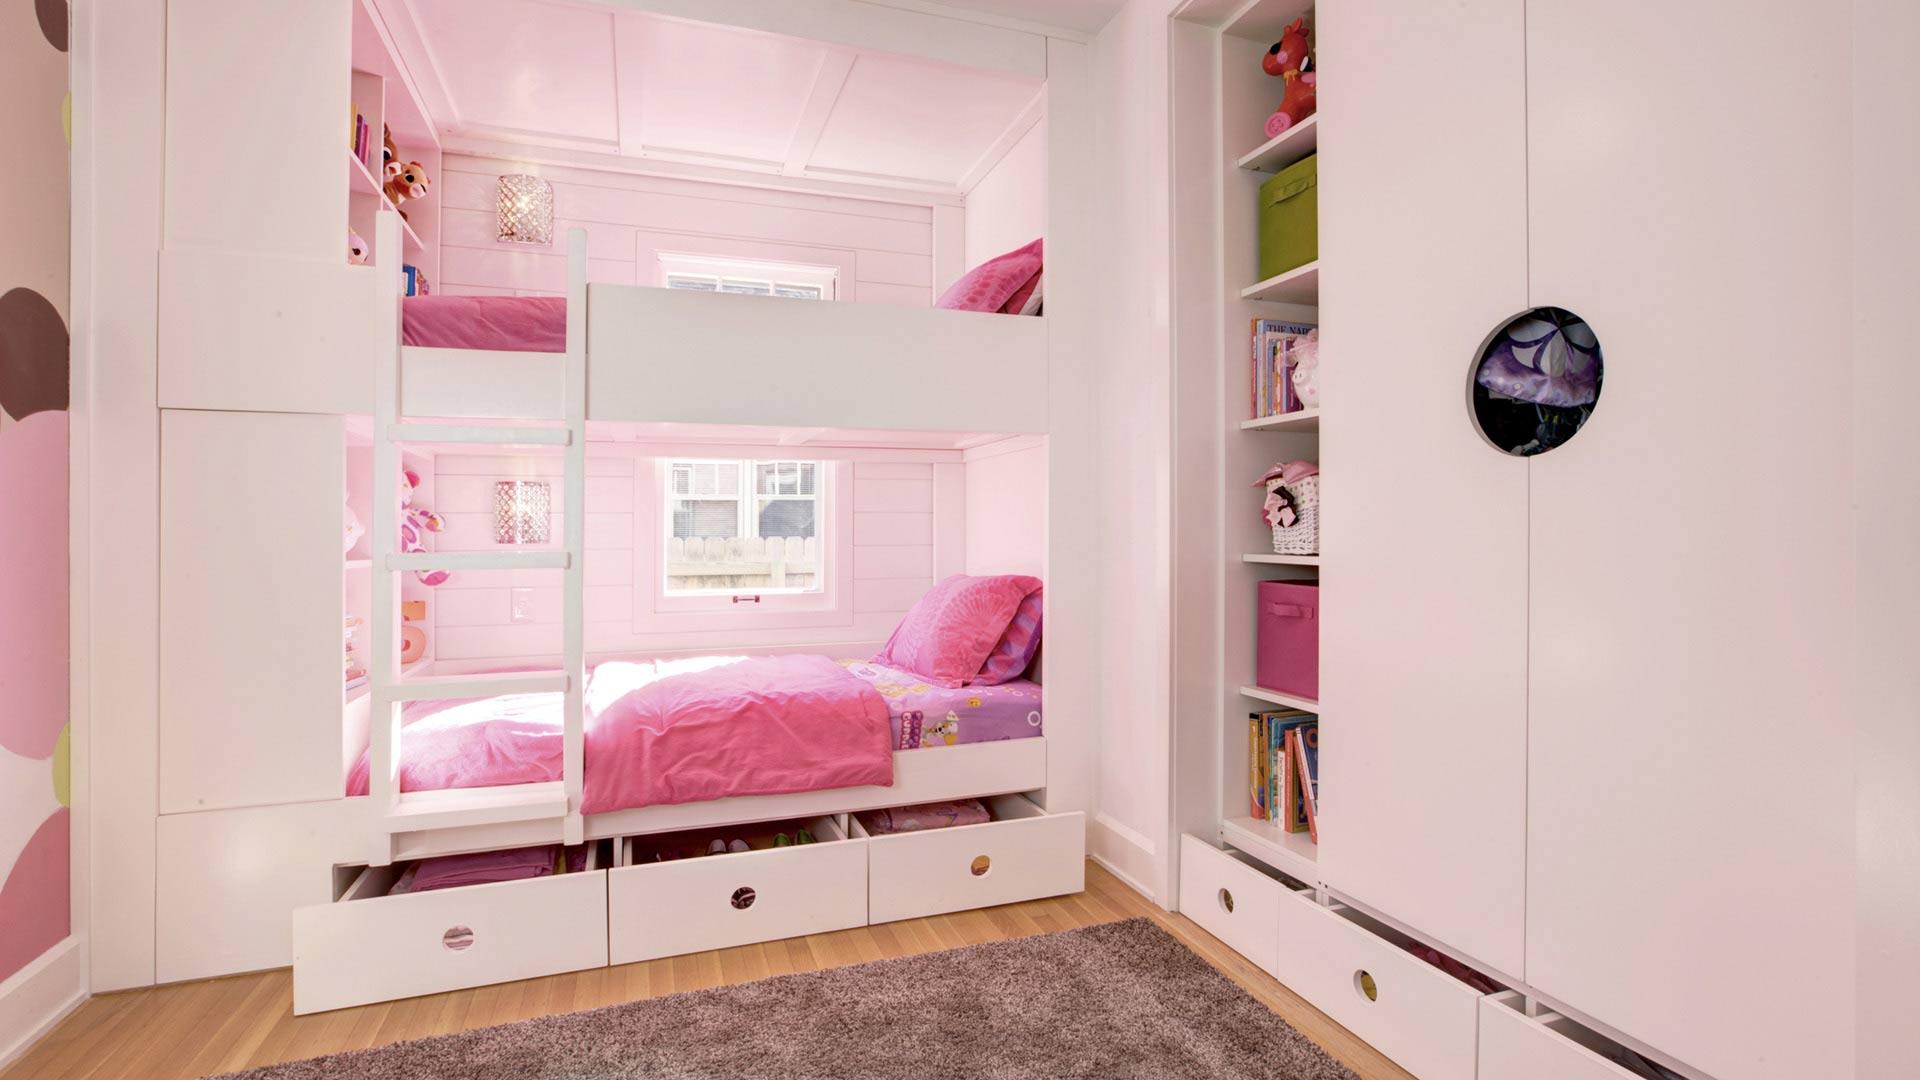 Classic Irvington Tudor Remodel - Custom Built-in Bunk Beds - HAUS Architecture, WERK Building Modern